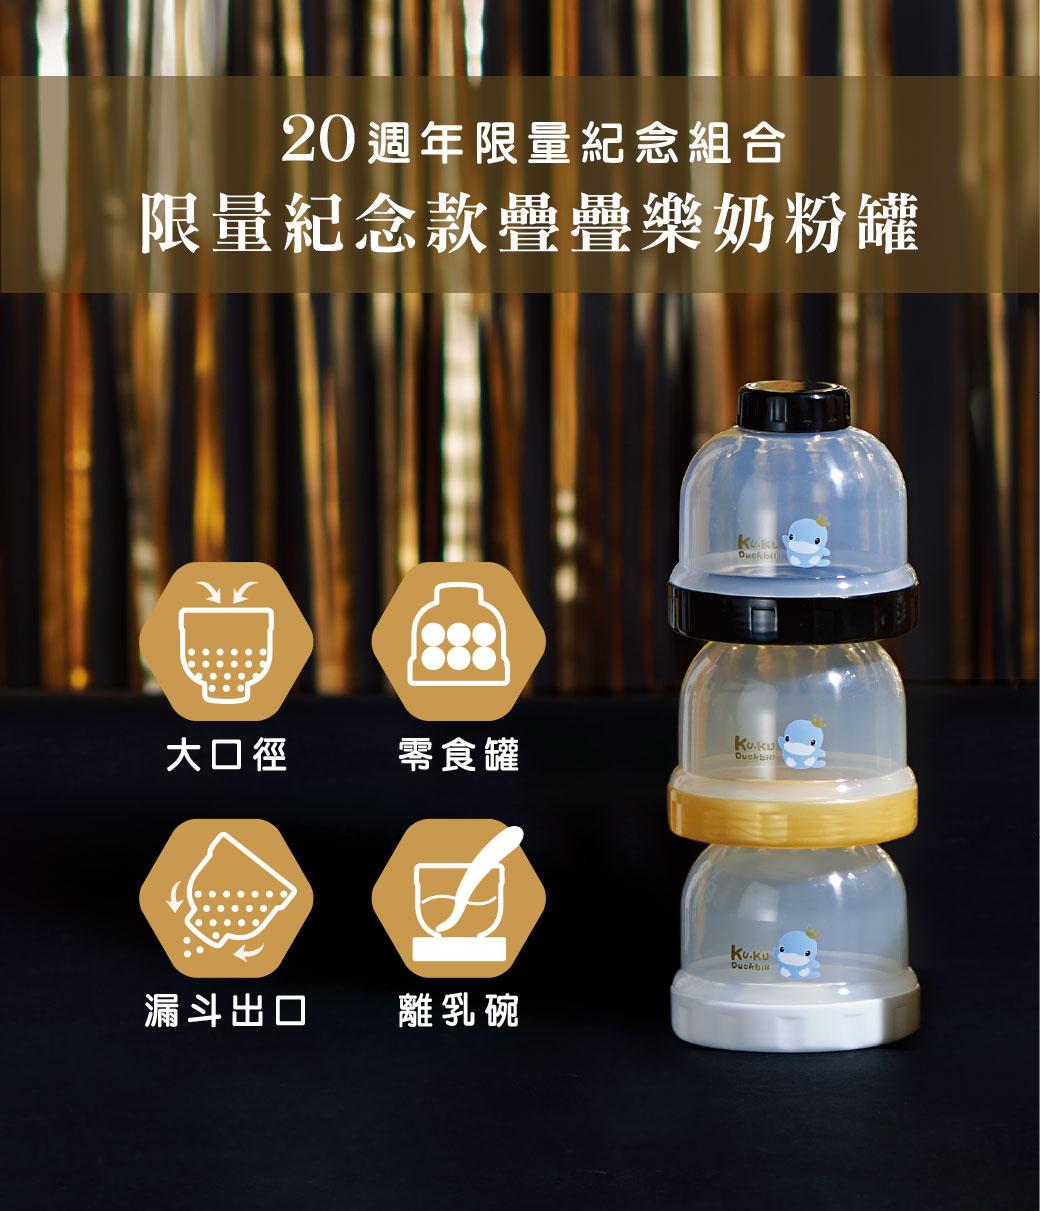 proimages/bottles/PPSU/5879/5879--20週年PPSU奶瓶組-EDM-11.jpg